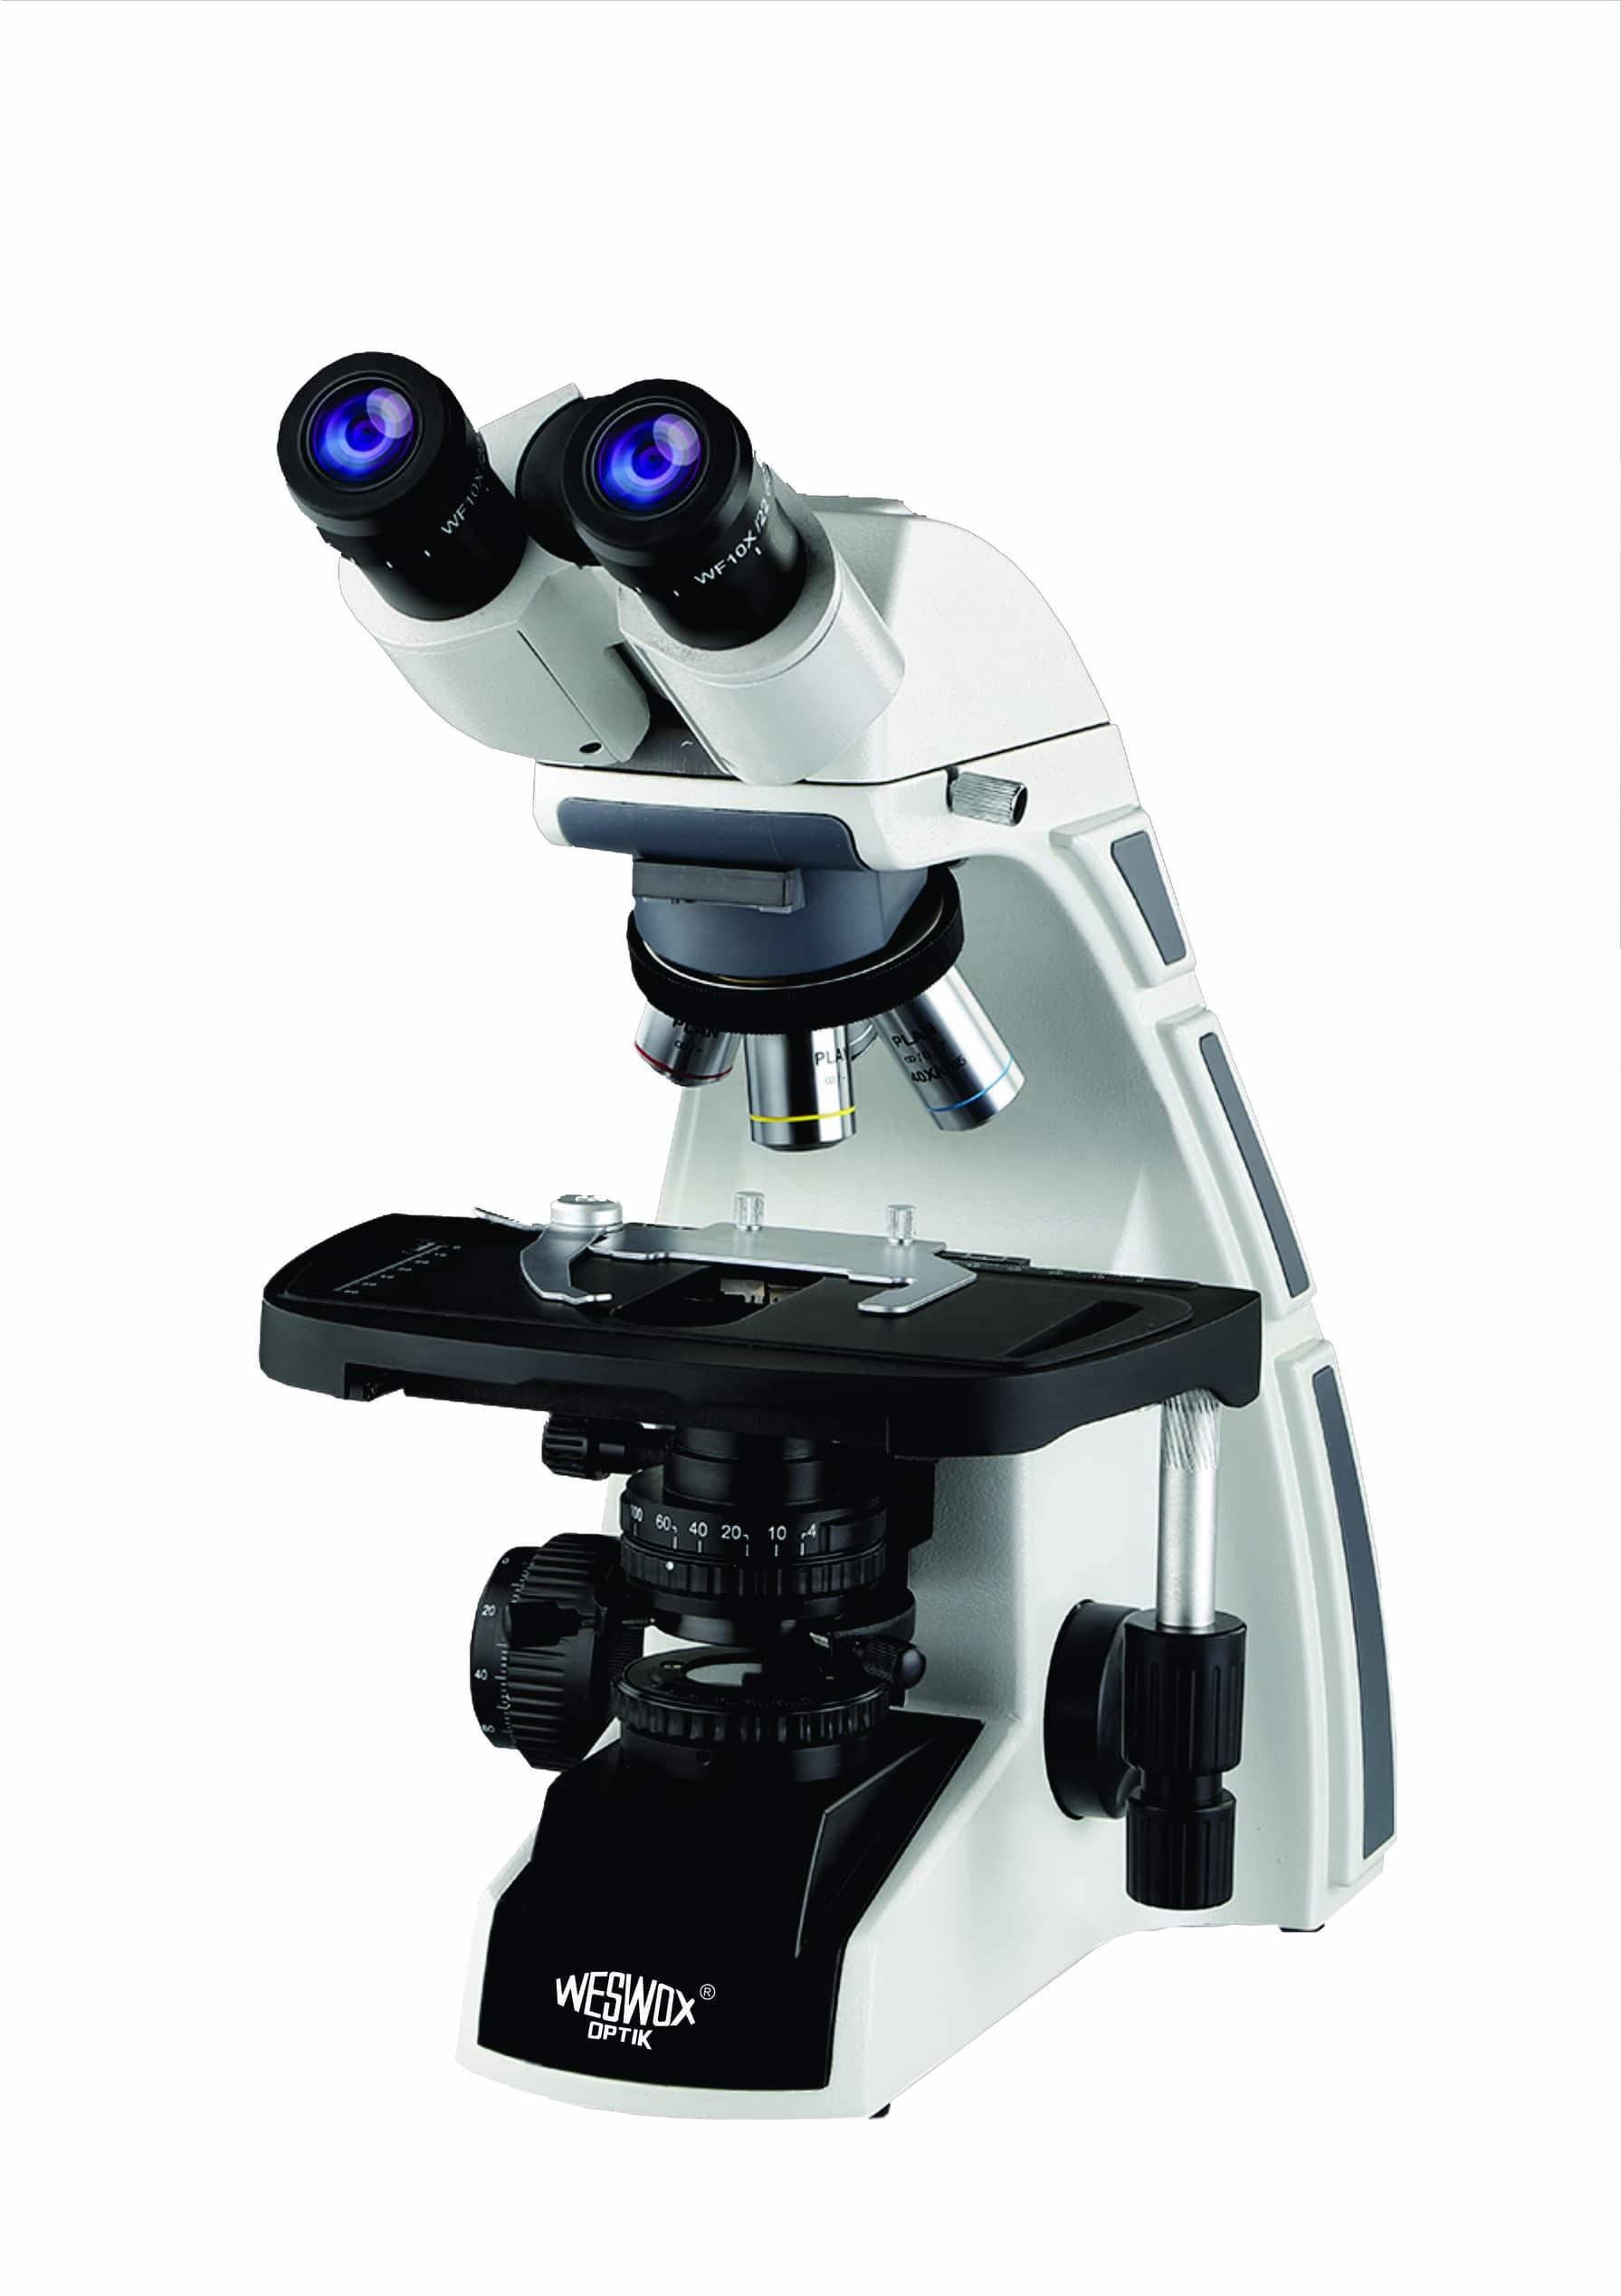 ADVANCE RESEARCH TRIINOCULAR CLINICAL MICROSCOPE